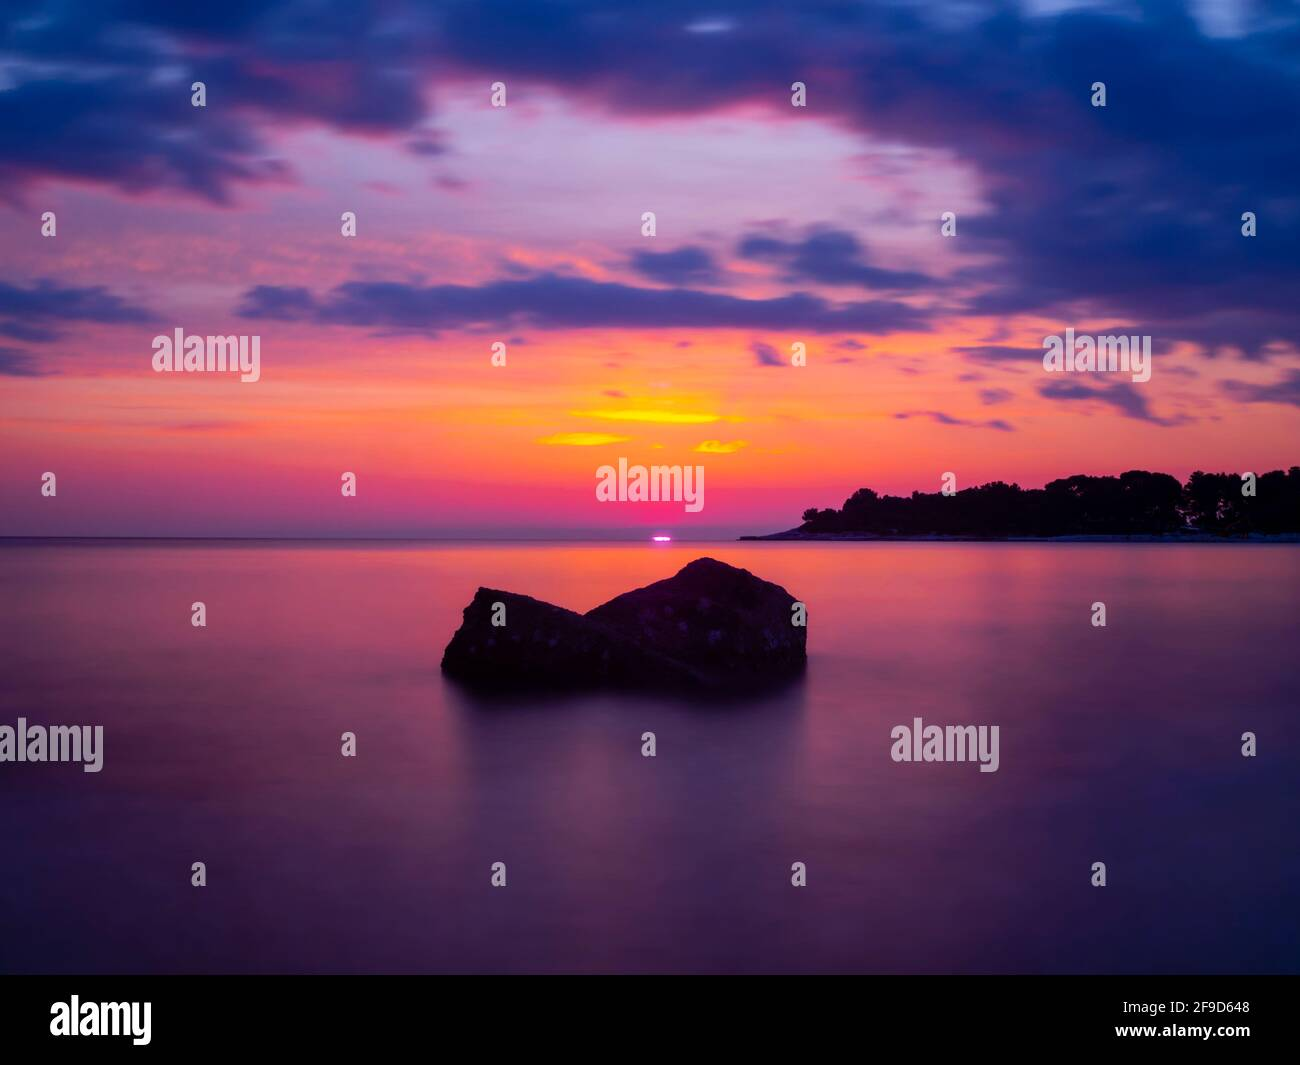 Rock boulder one single lonely loneliness alone sunset dusk gorgeous stunning idyllic pretty beautiful seaside evening tranquility Stock Photo